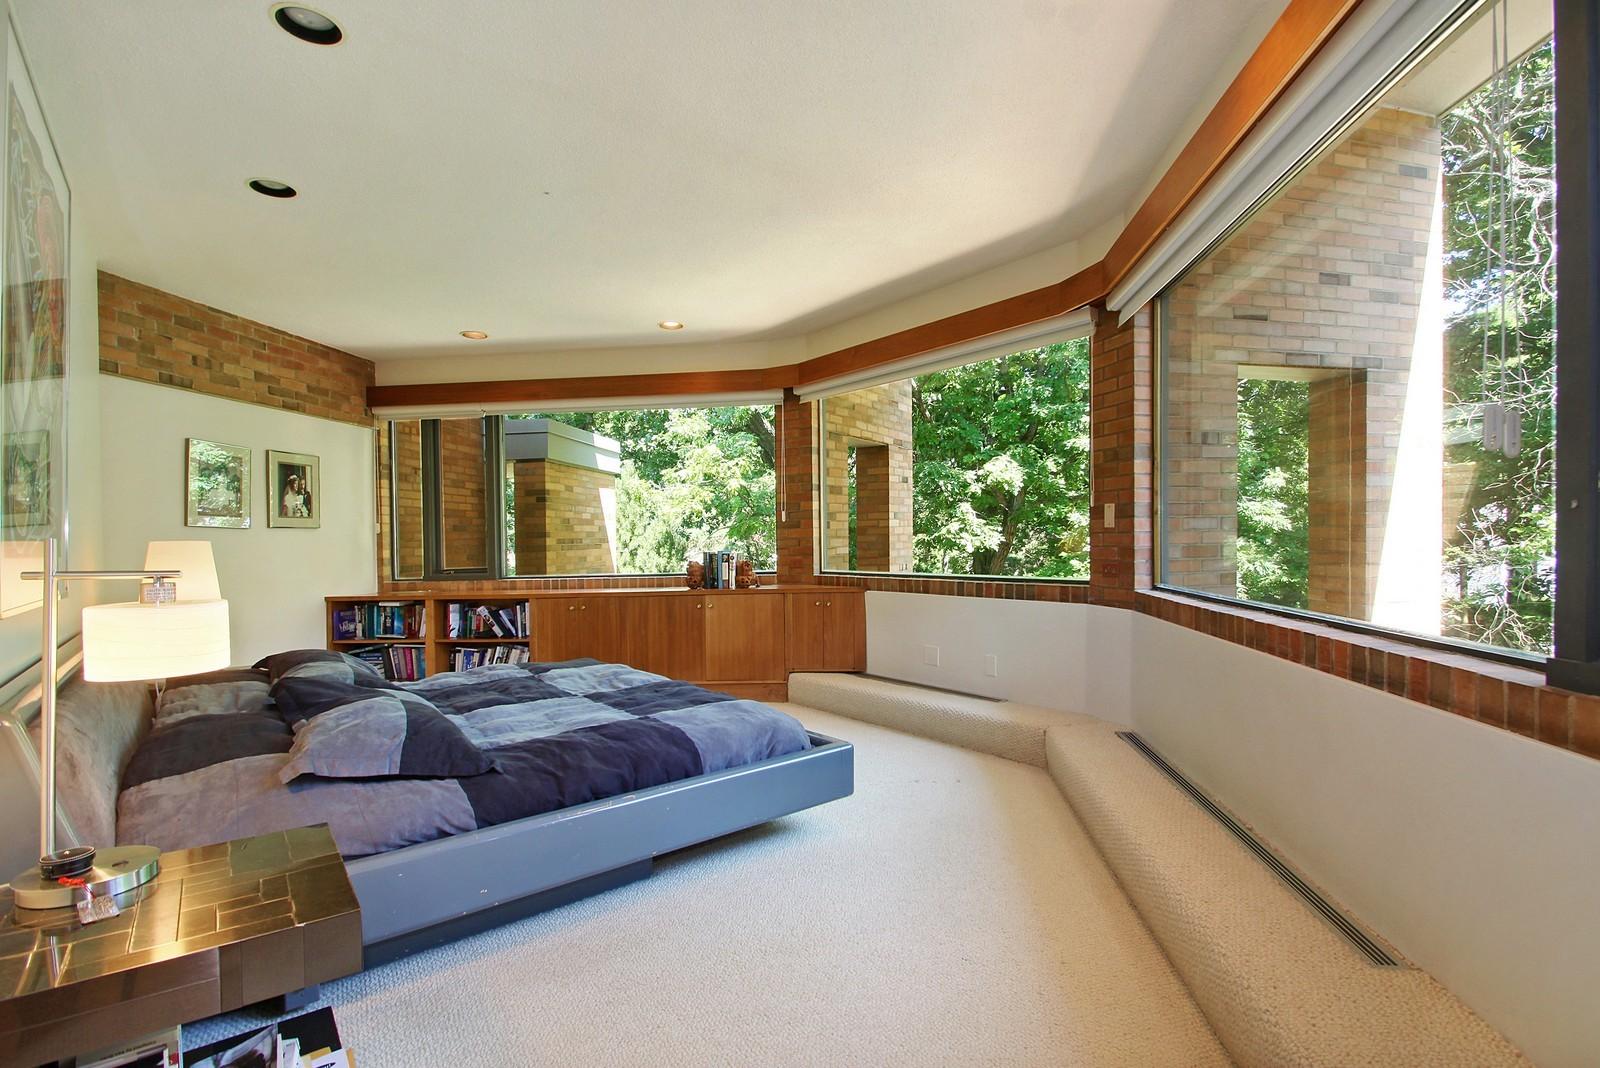 Real Estate Photography - 350 Sunrise Circle, Glencoe, IL, 60022 - Master Bedroom